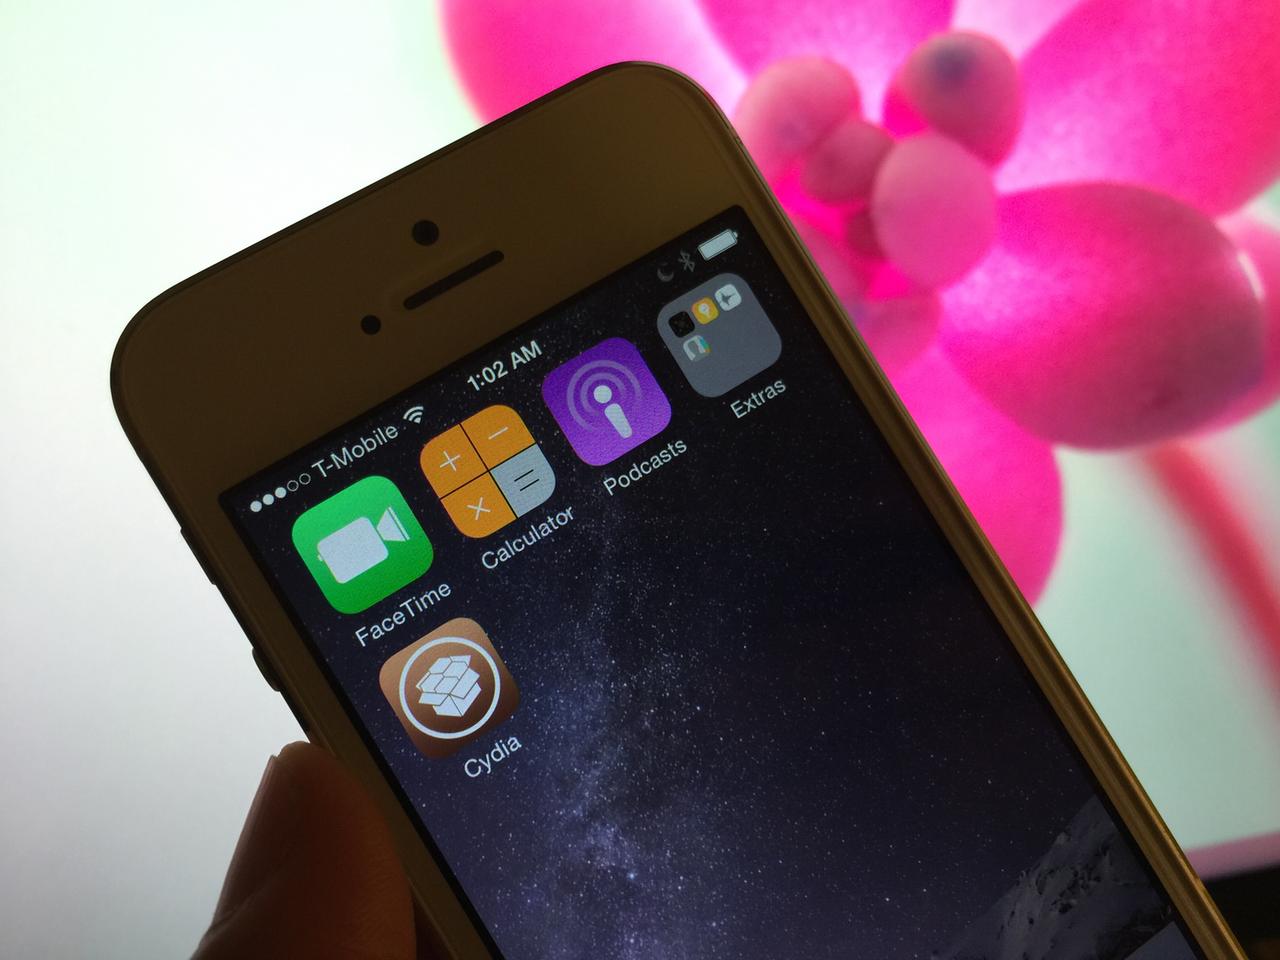 Jailbreak iOS 8.2 beta TaiG Windows